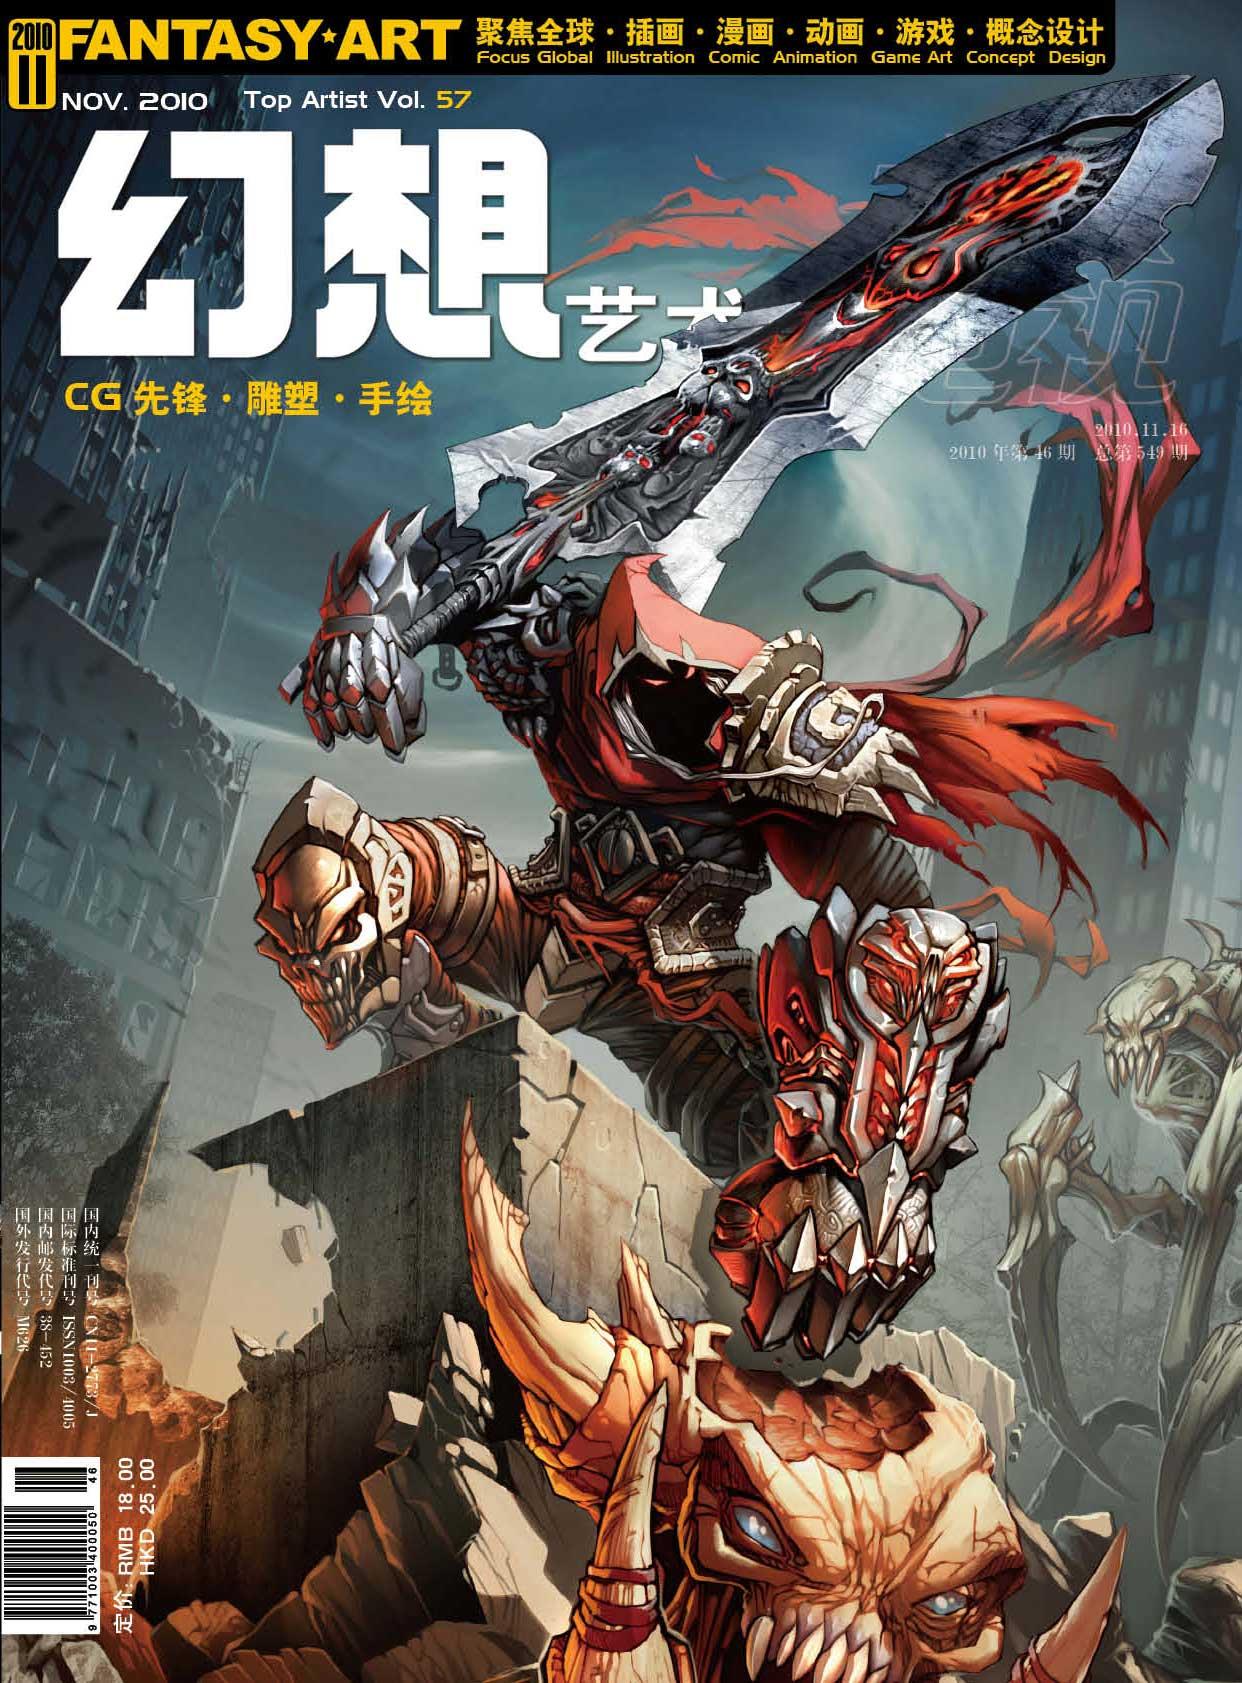 Fantasy Art Magazine Cover By El Grimlock On Deviantart